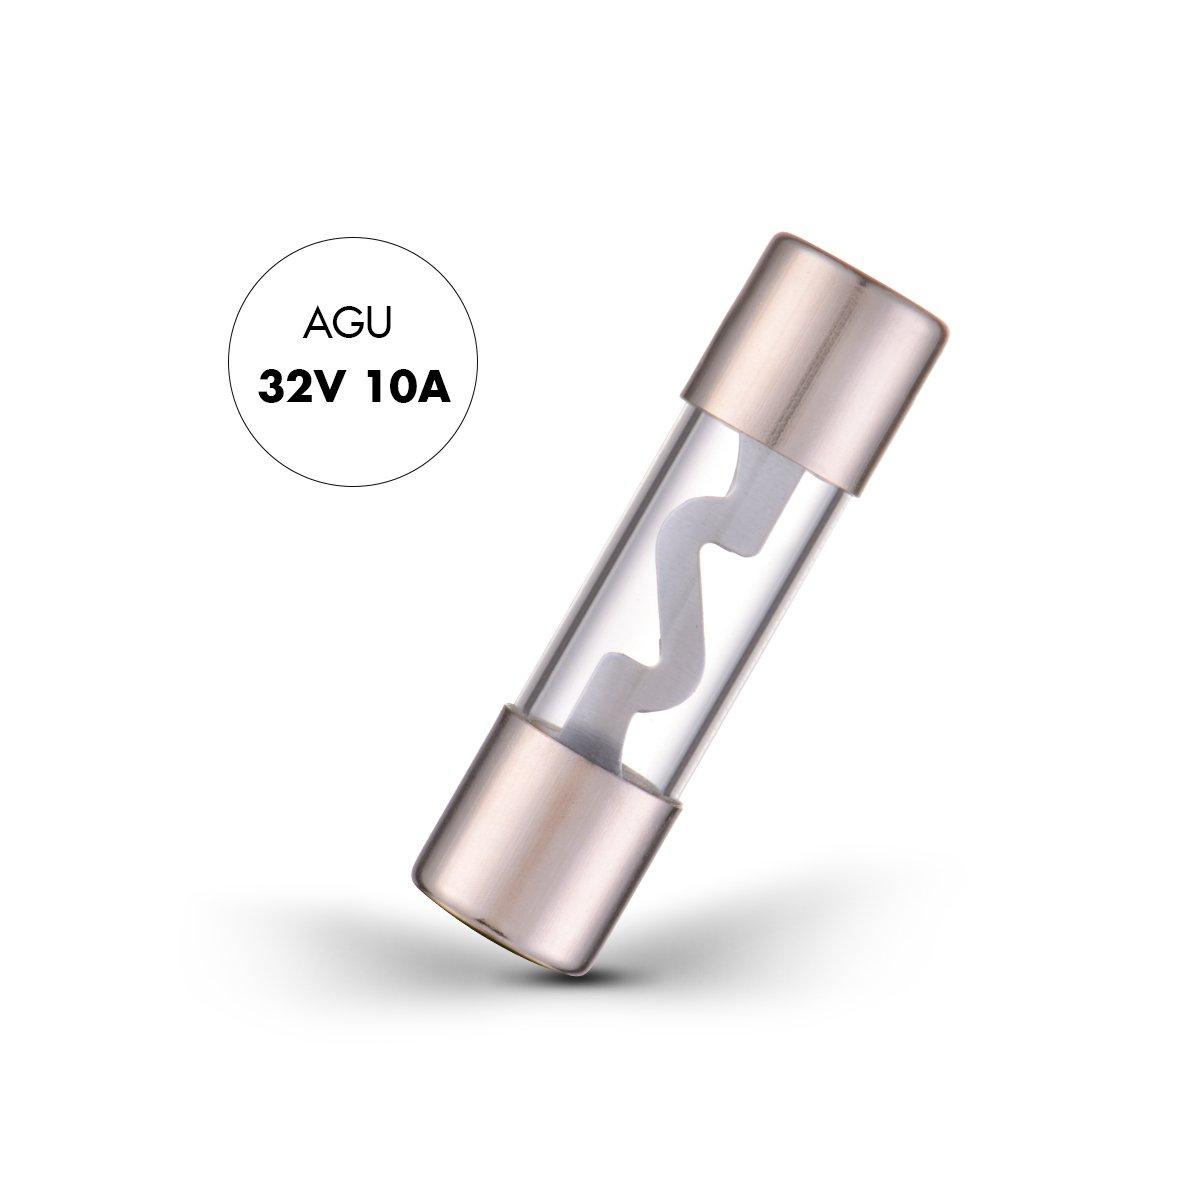 Sunix 10 Amp AGU Fuse 5 Pack